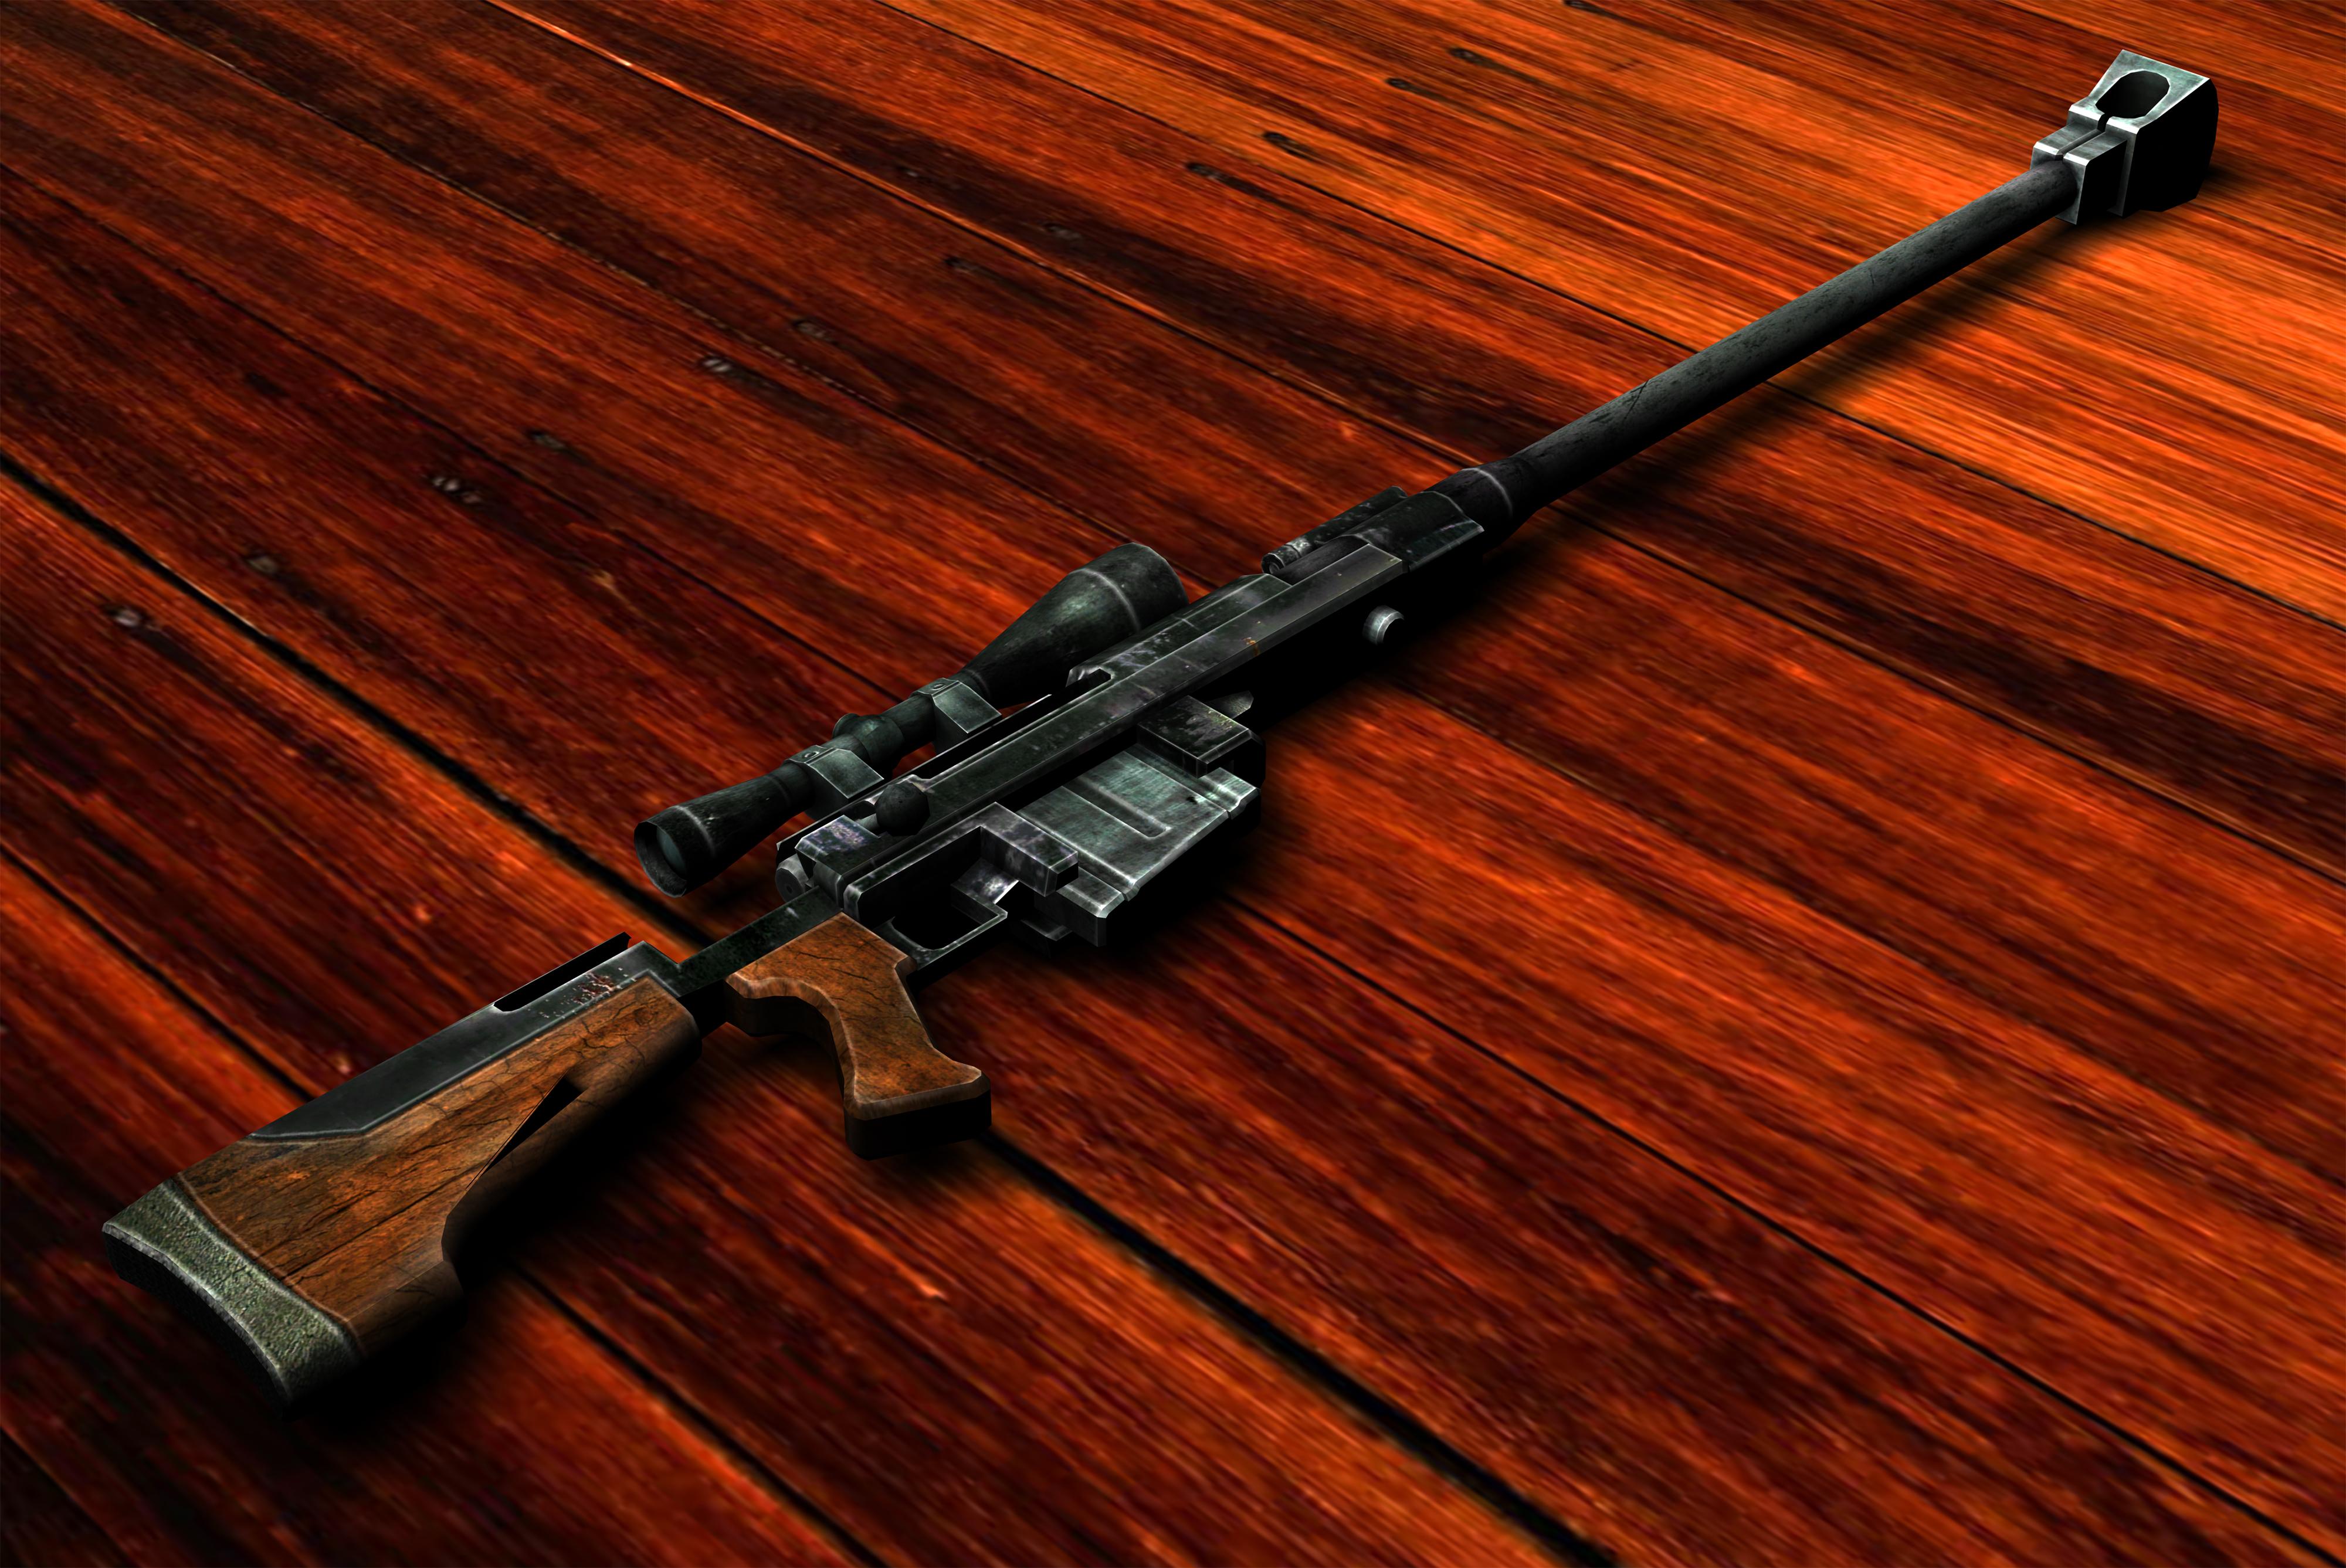 Shooting Material: Anti-materiel Rifle